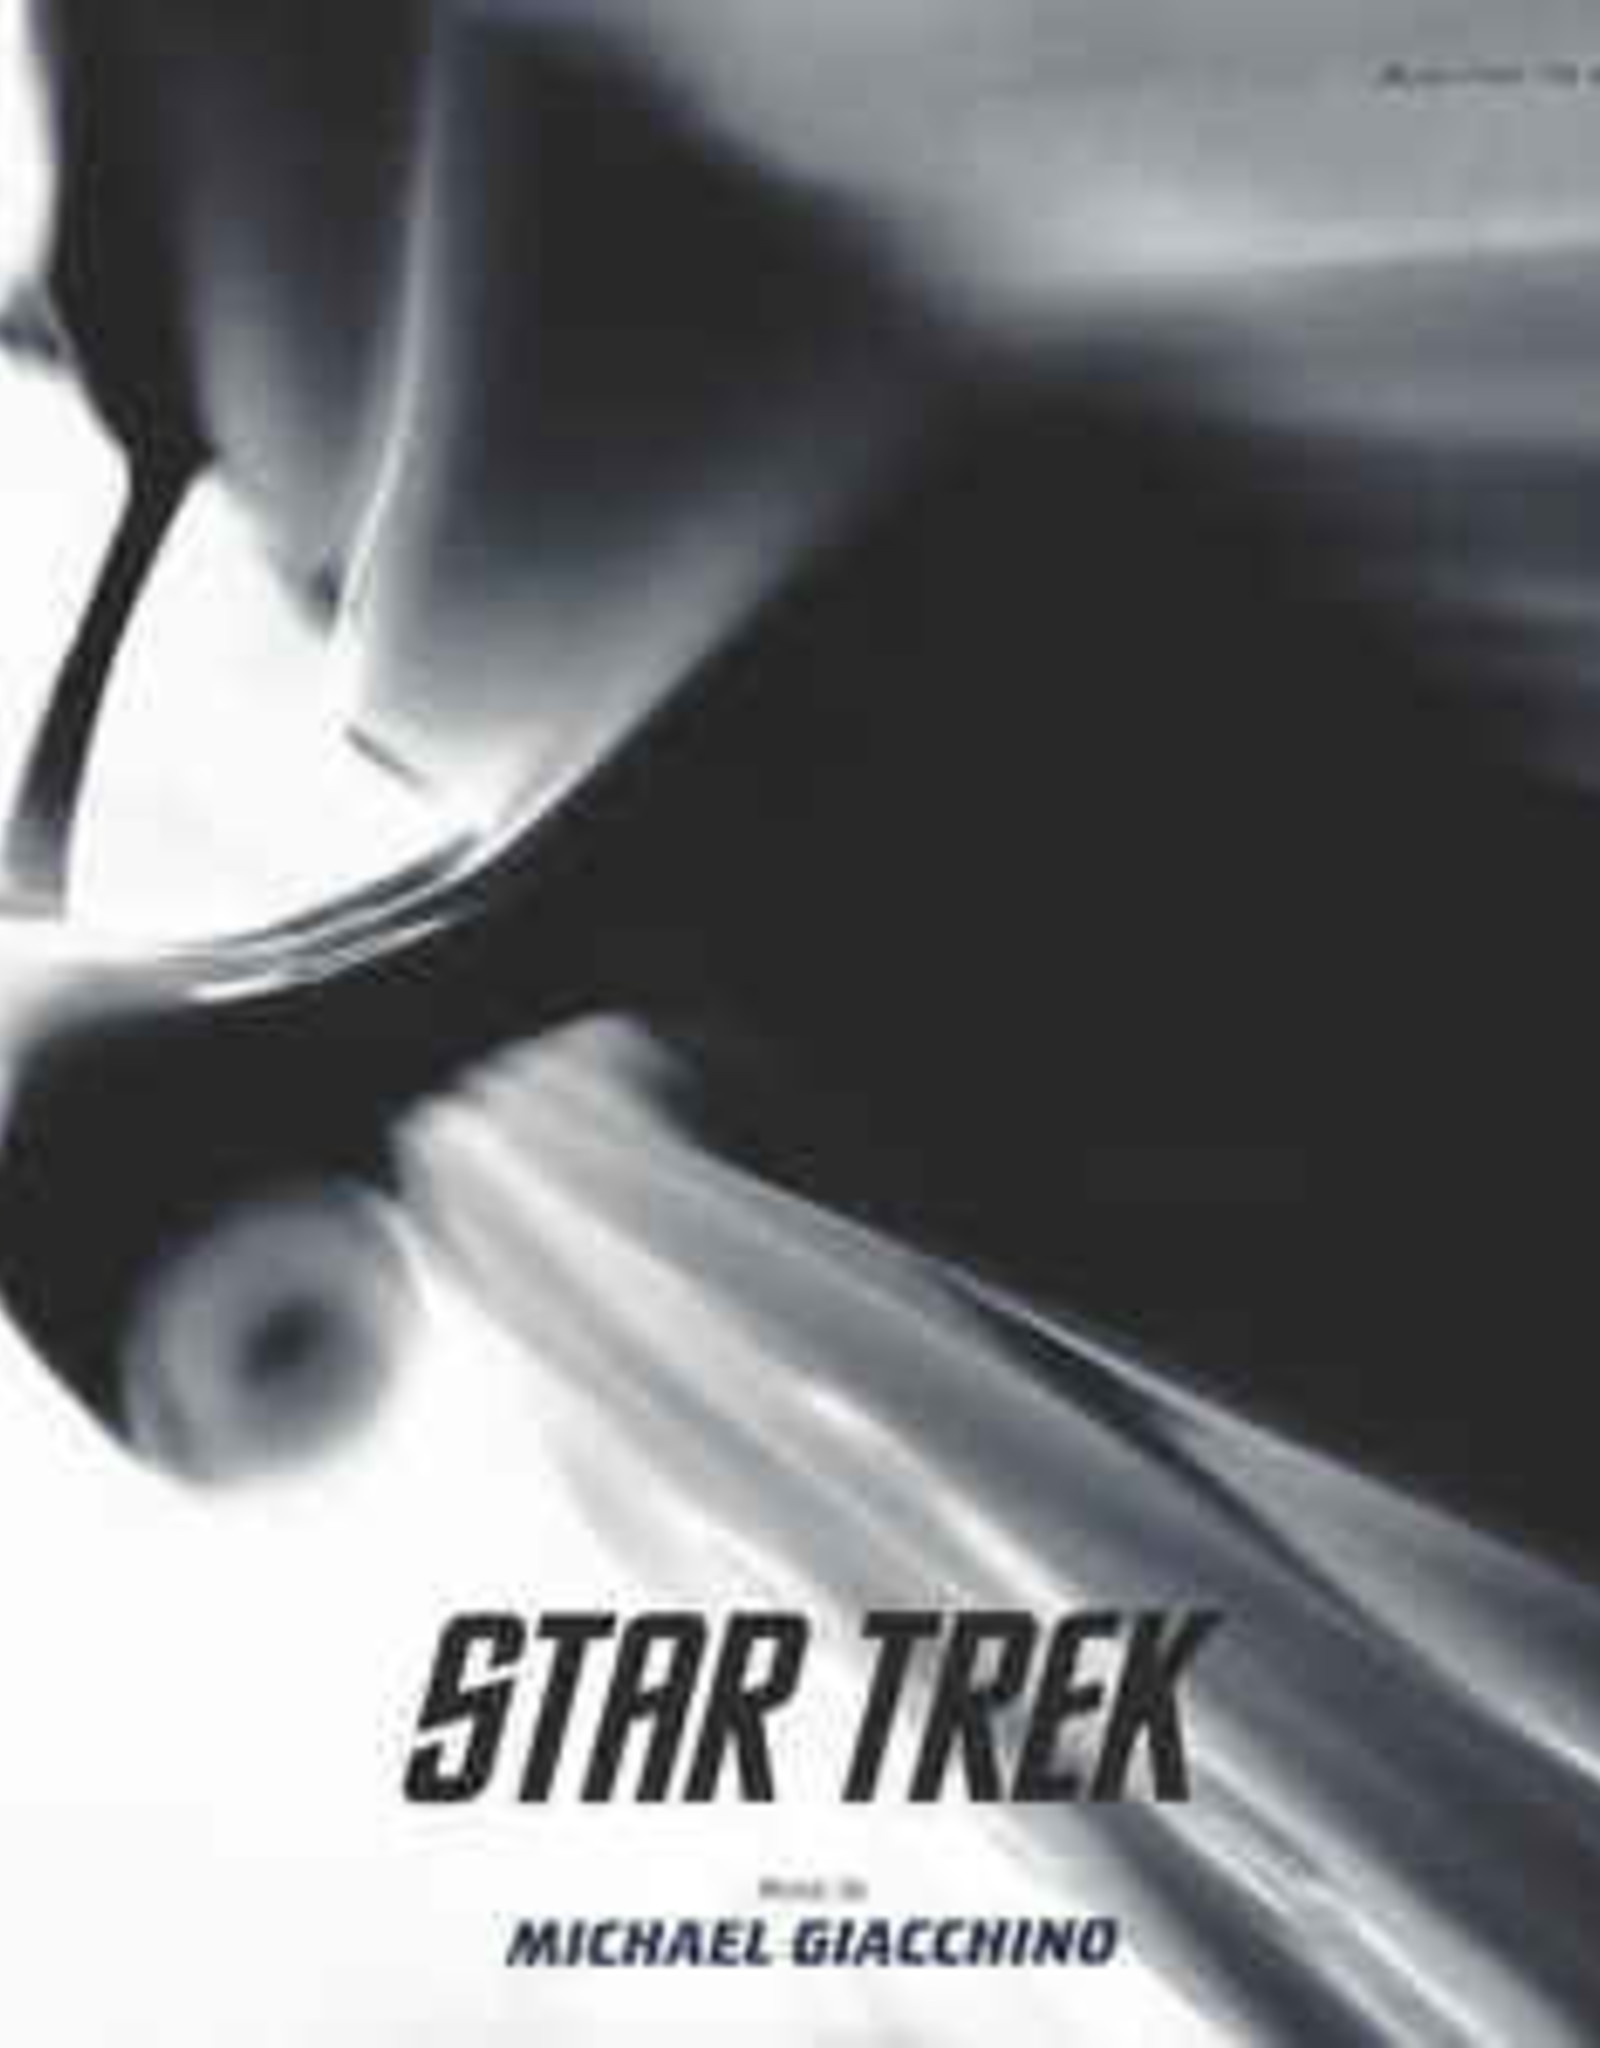 Michael Giacchino - Star Trek: Beyond Ost (Lp)(RSD 2019)